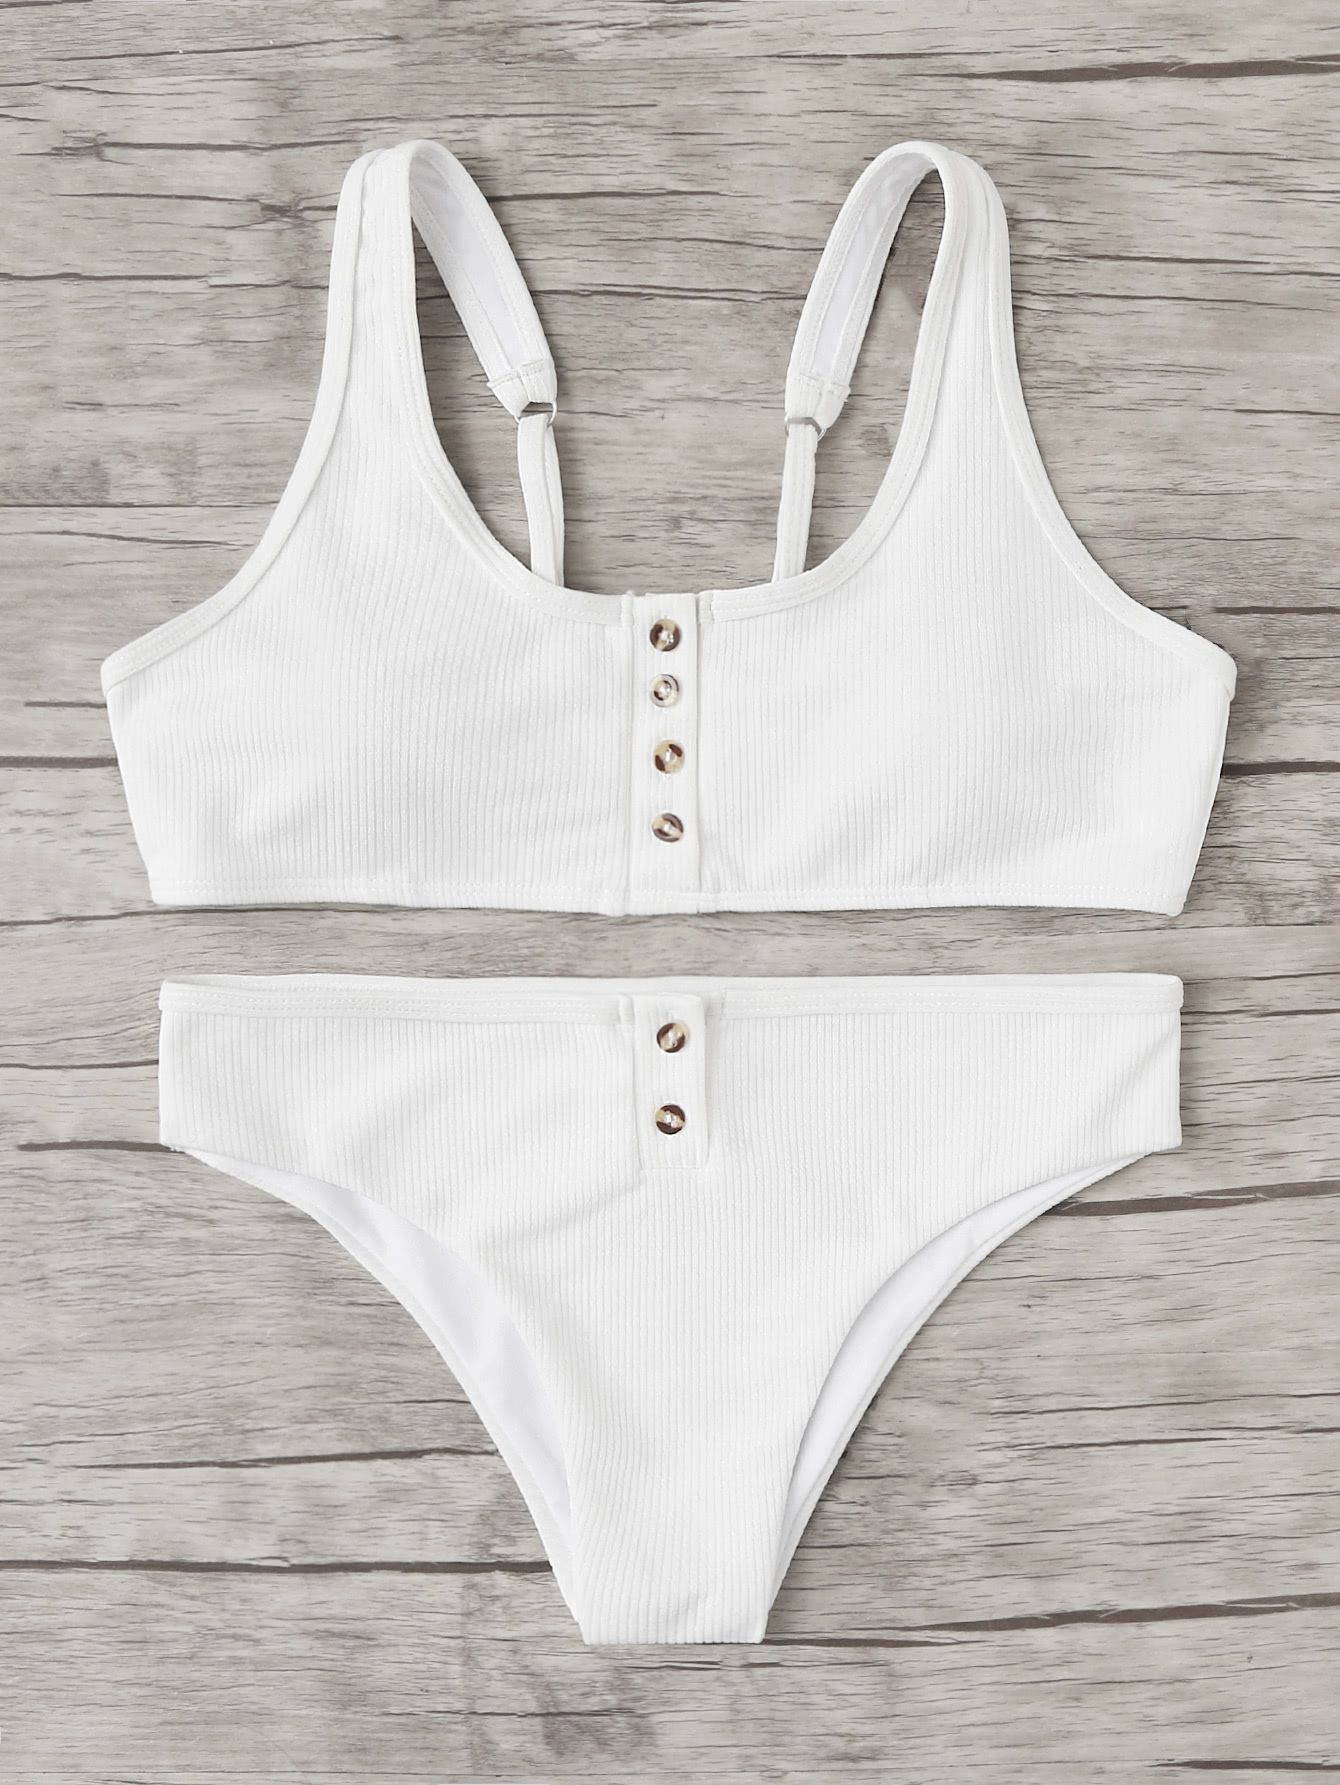 69fda9af8c Shop Button Front Bikini Set online. SheIn offers Button Front Bikini Set &  more to